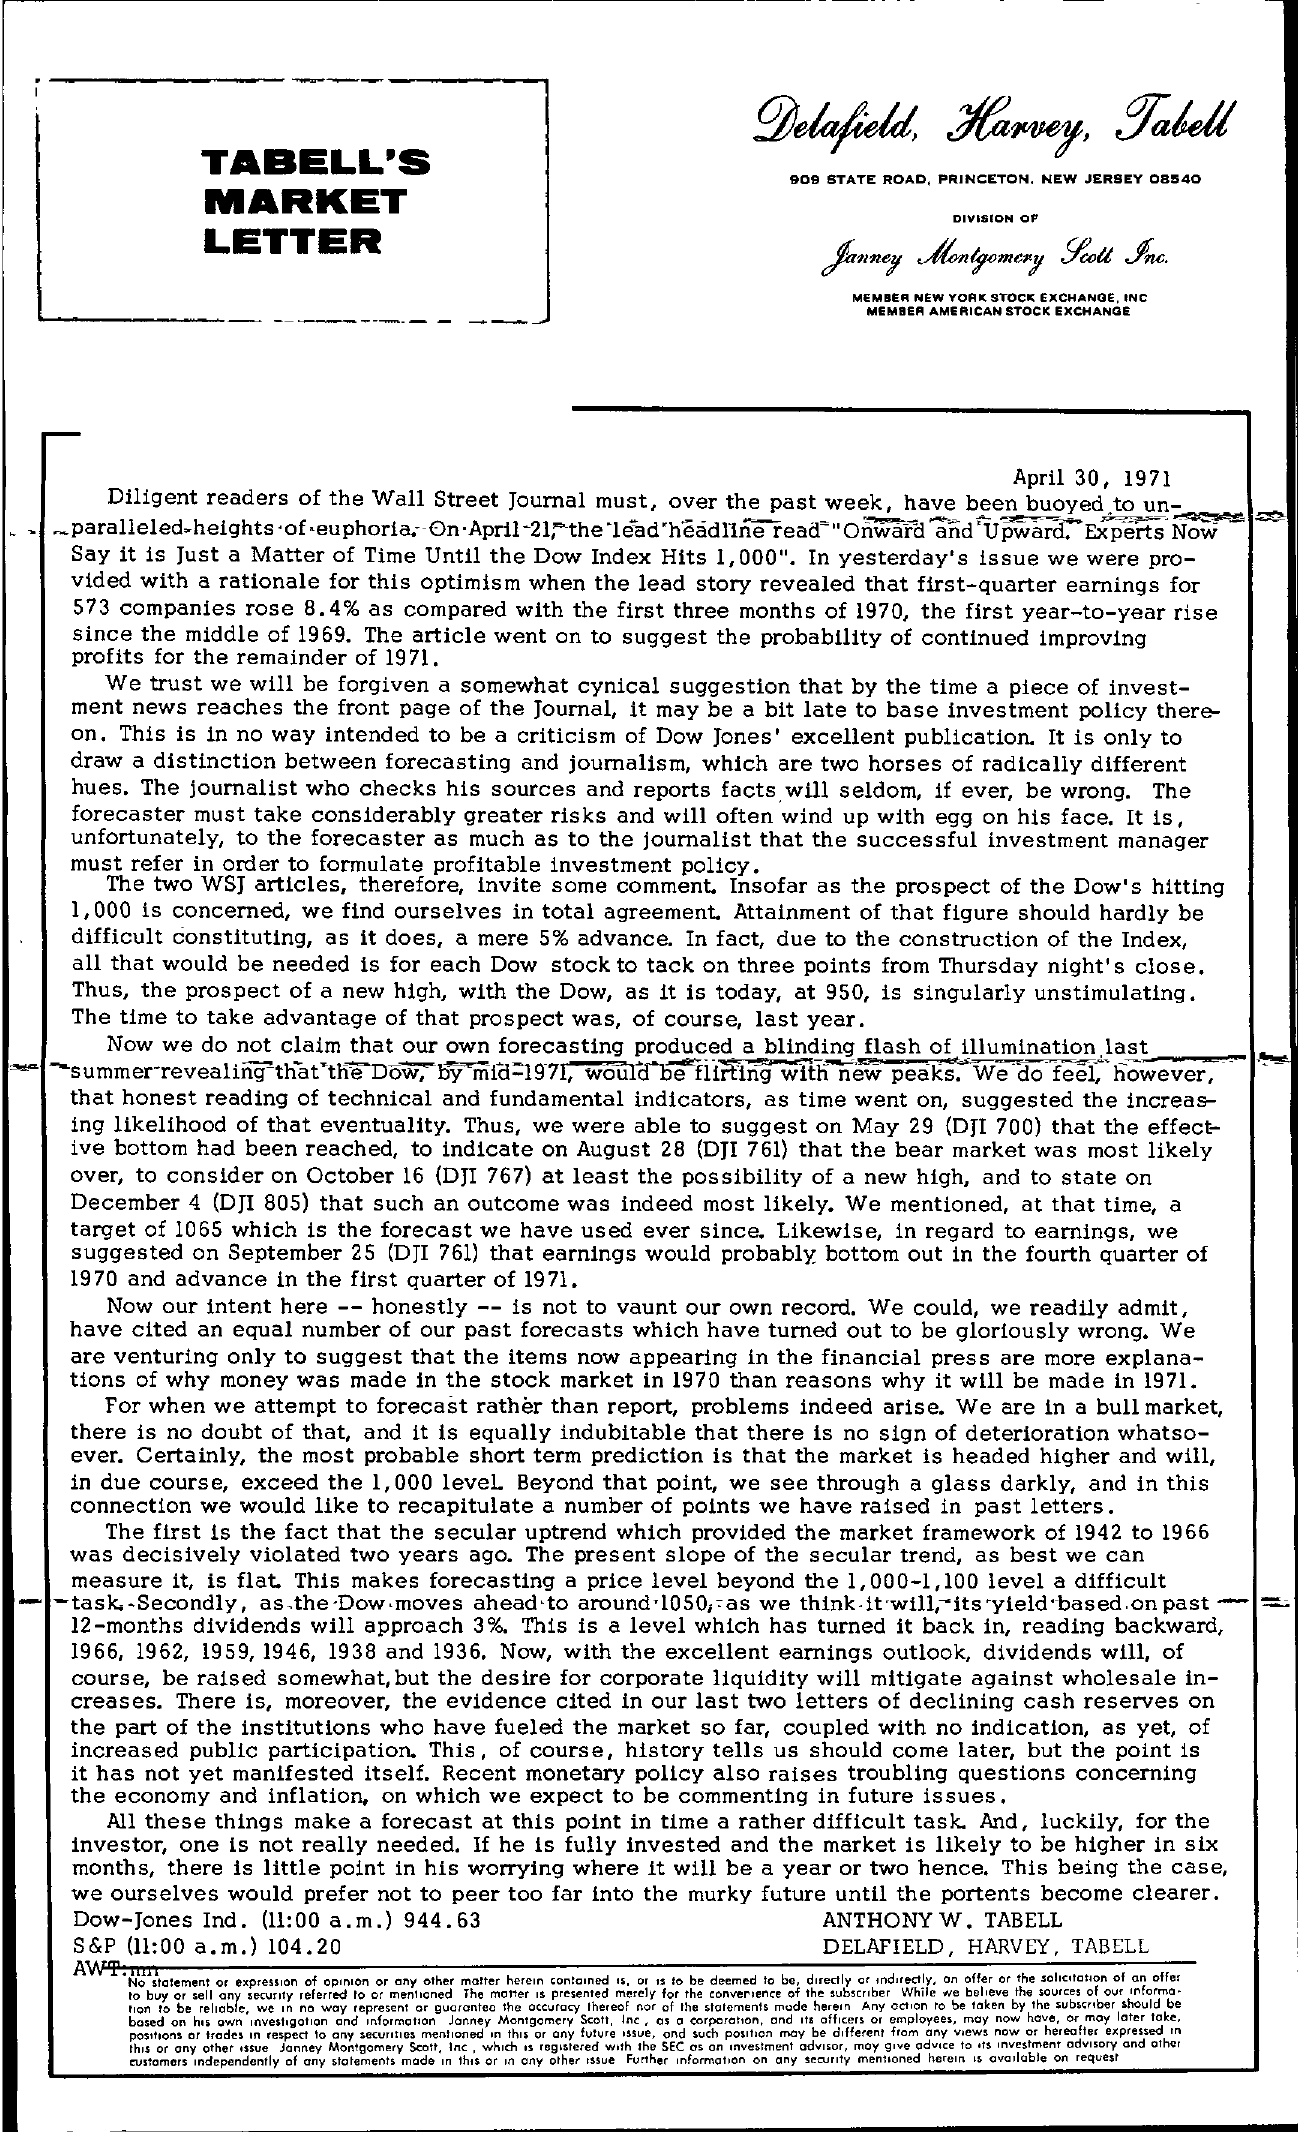 Tabell's Market Letter - April 30, 1971